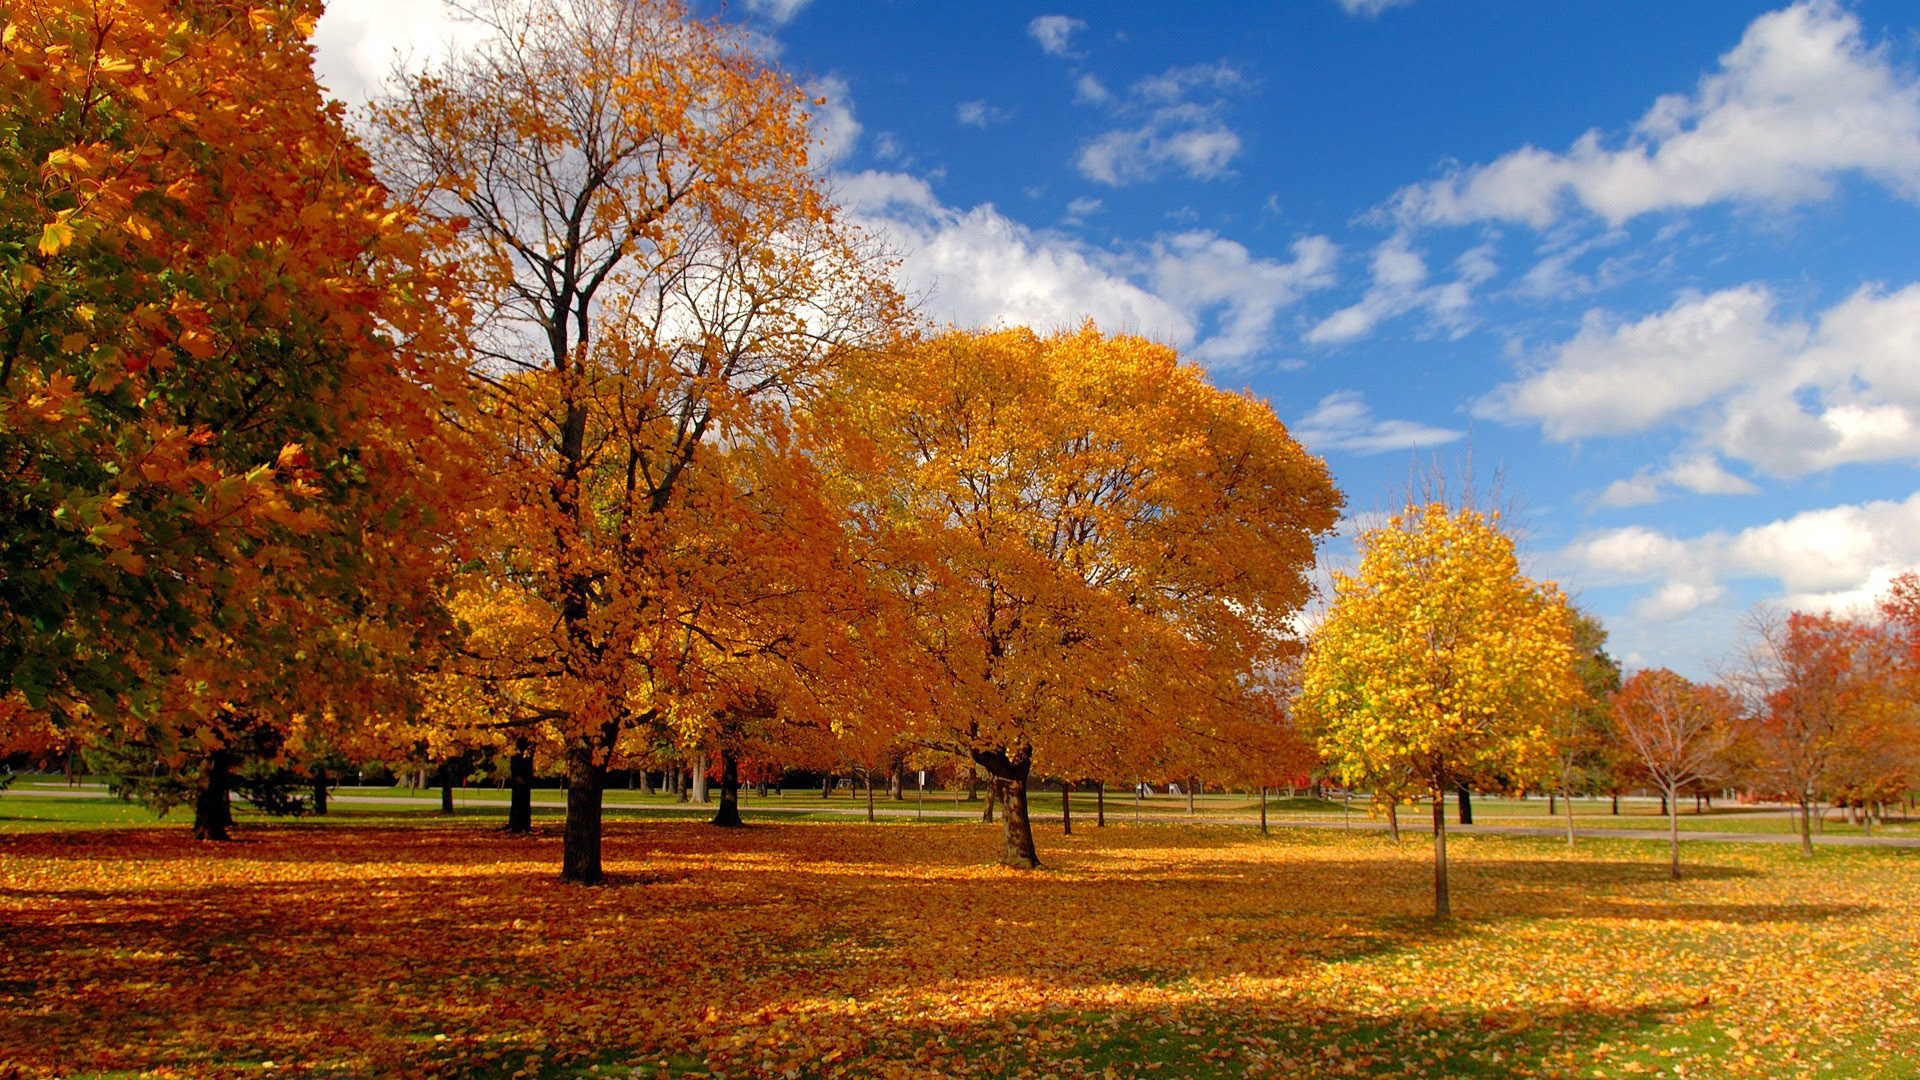 Fall trees wallpaper   792781 1920x1080